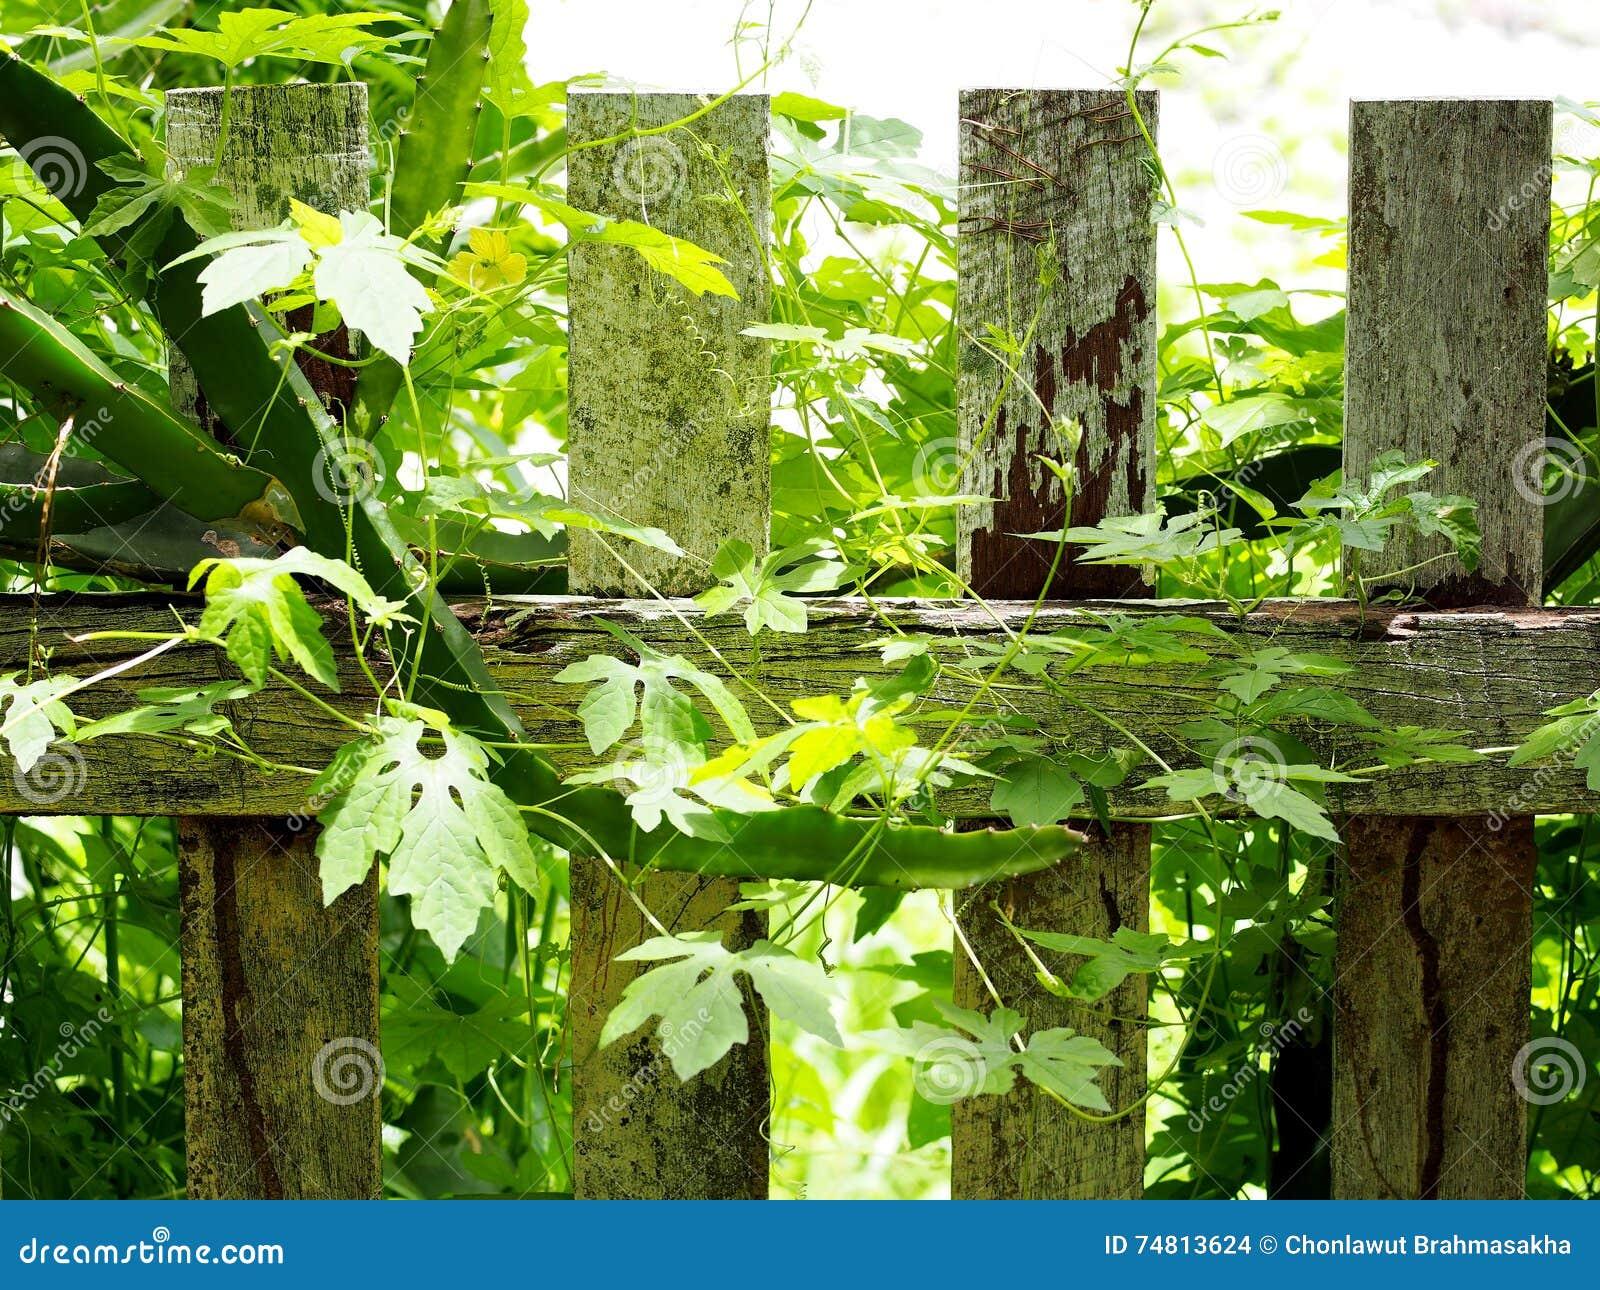 Natural Growth Tropical Herbal Medicine Creeping Plant Stock